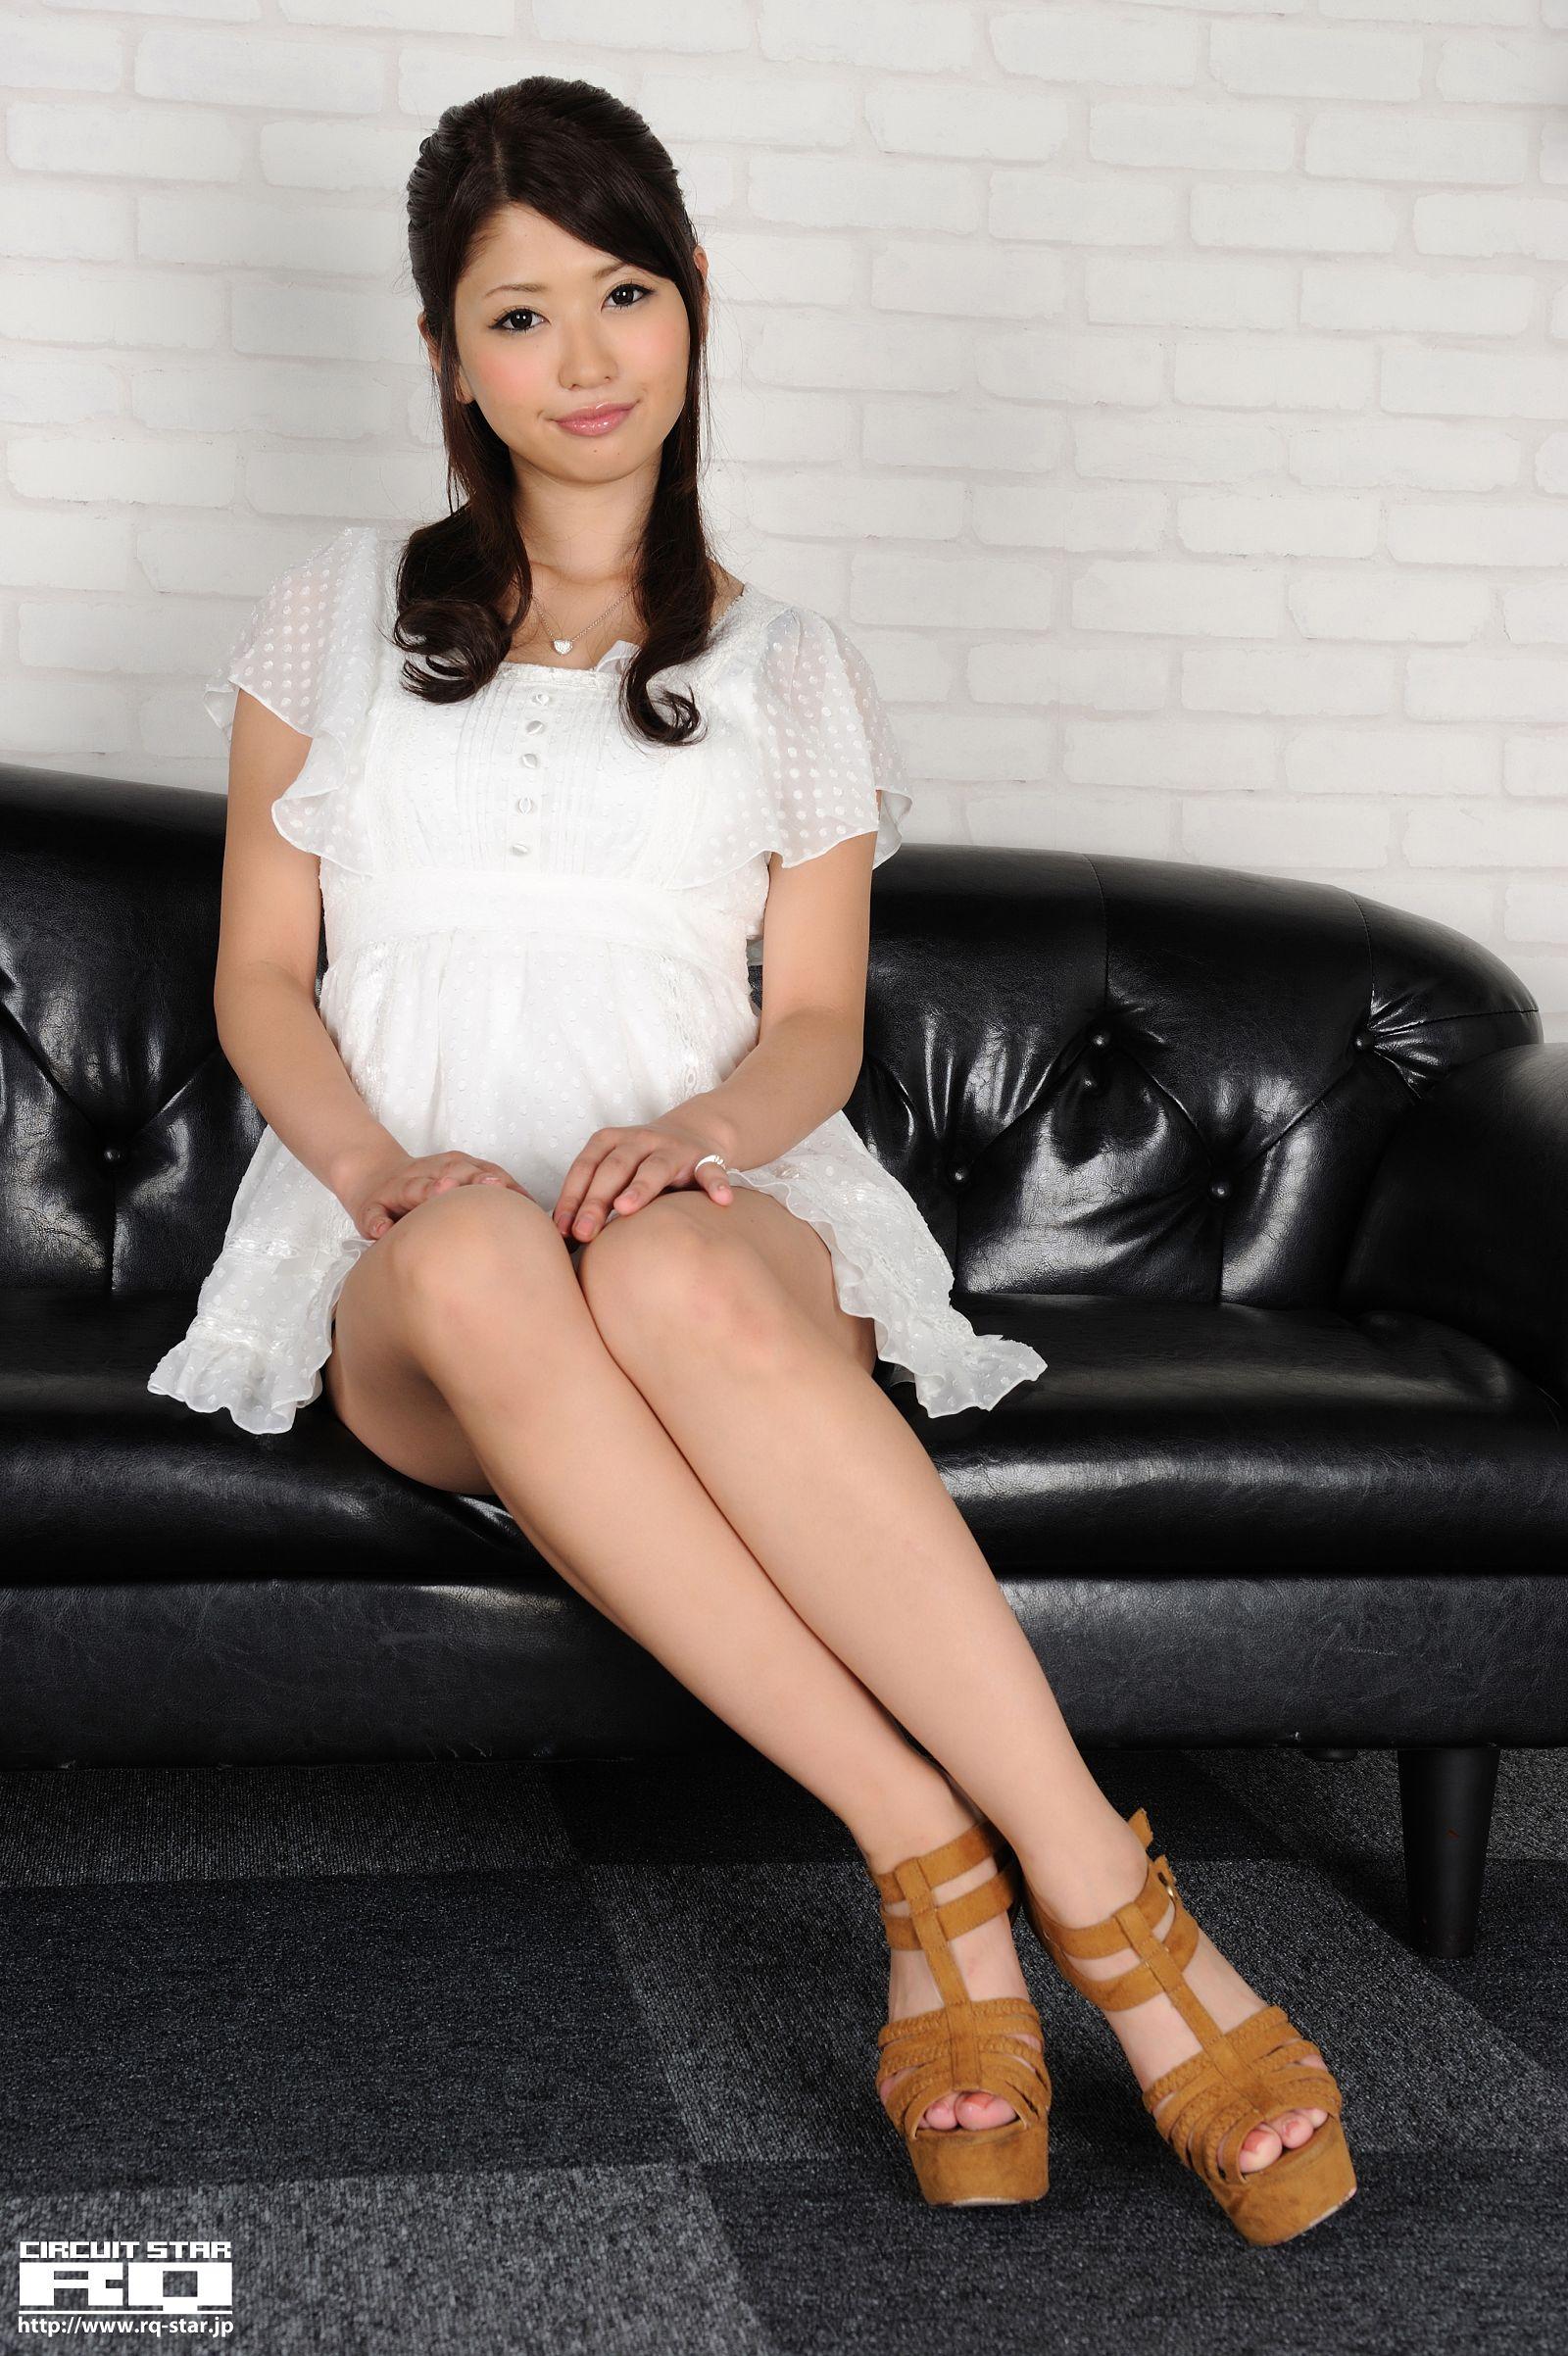 [RQ STAR美女] NO.01092 Hitomi Nose 能勢ひとみ Private Dress[72P] RQ STAR 第1张